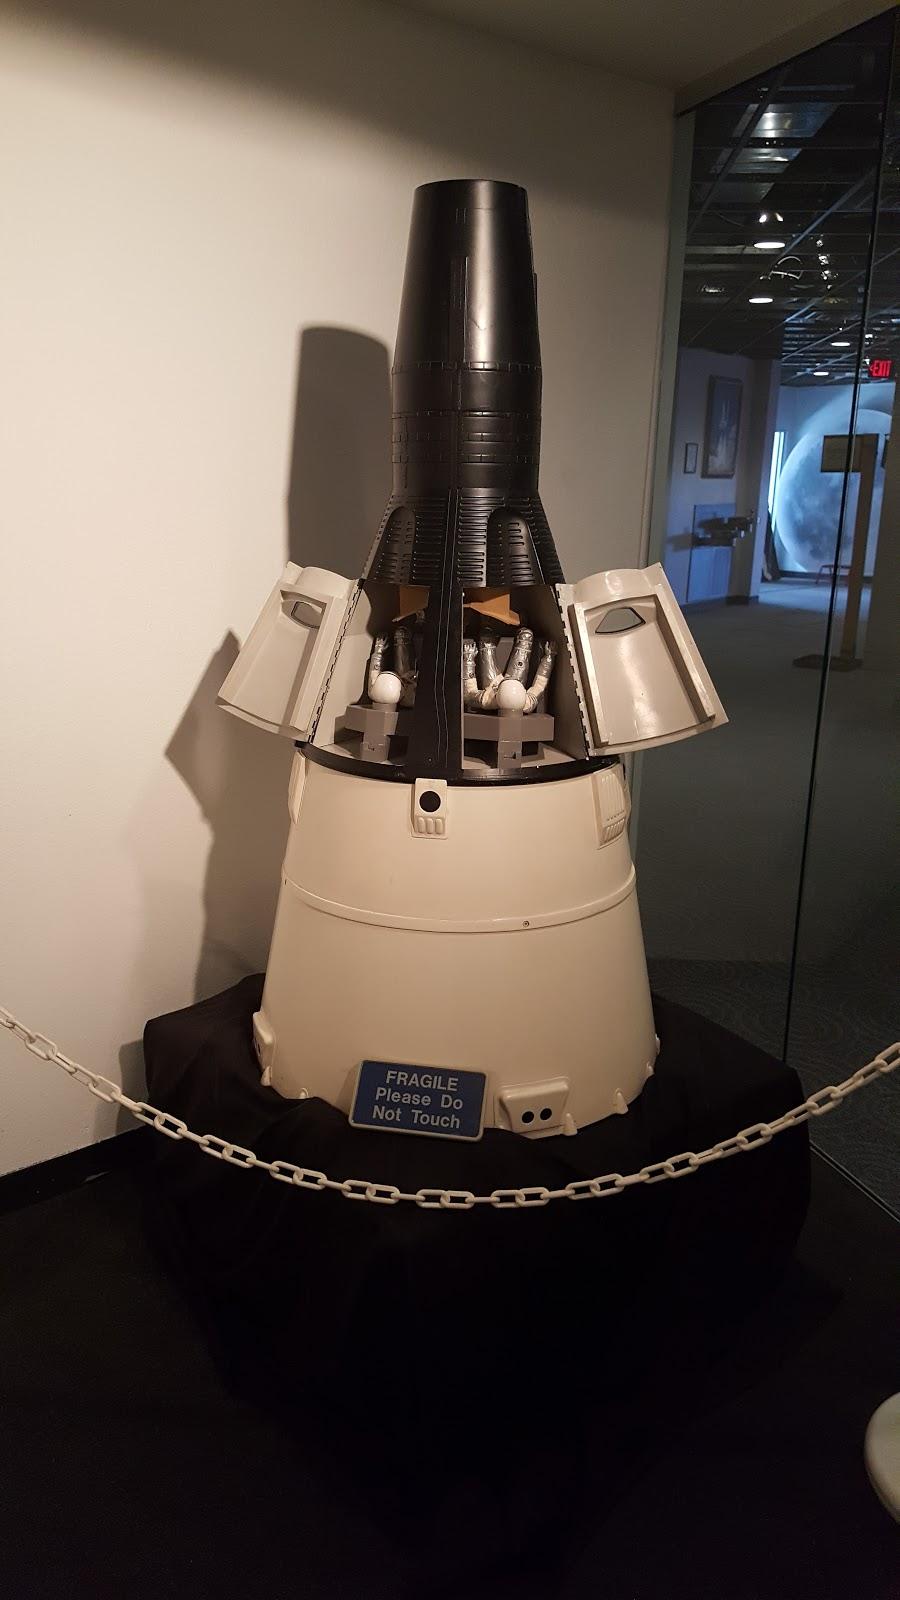 Arizona Challenger Space Center - museum    Photo 3 of 10   Address: 17835 N 44th St, Phoenix, AZ 85032, USA   Phone: (623) 322-2001